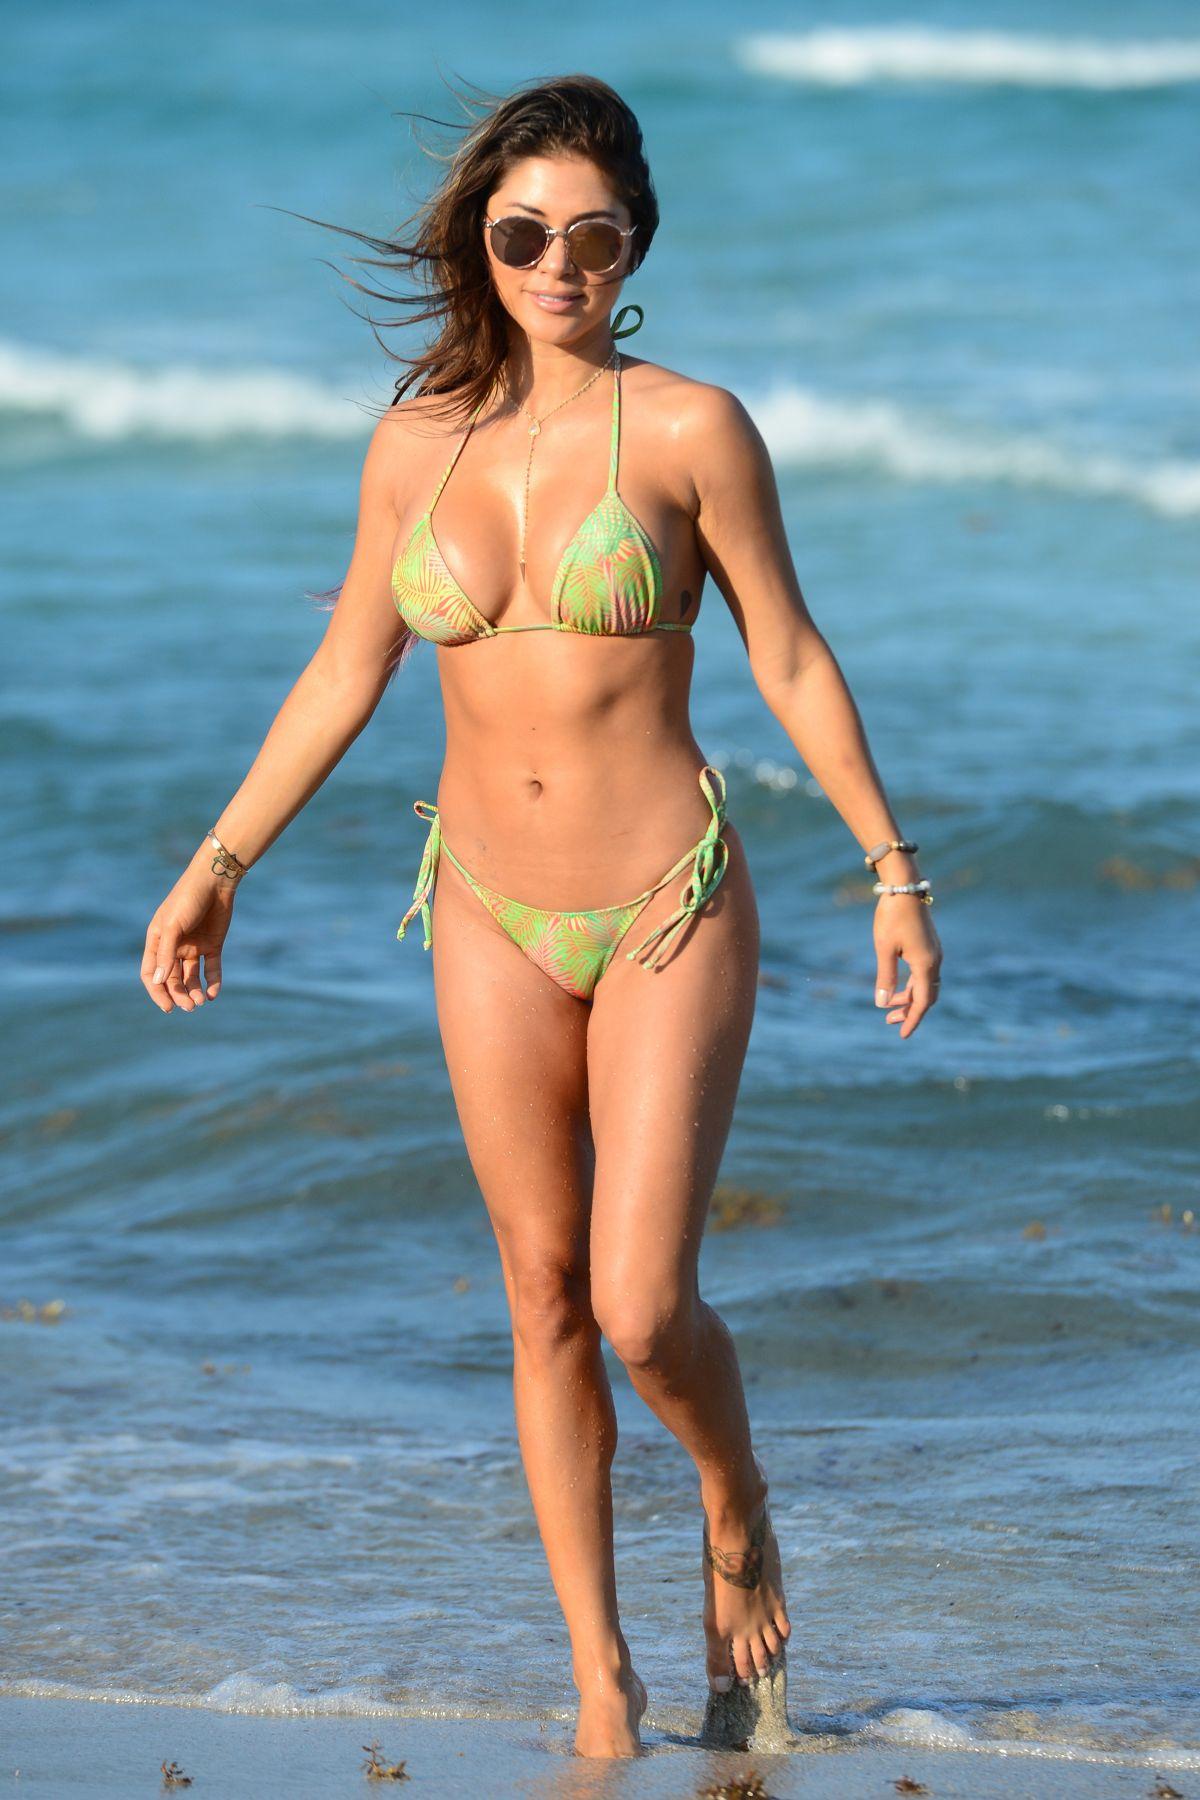 Bikini Arianny Celeste nudes (28 photos), Tits, Paparazzi, Twitter, legs 2020